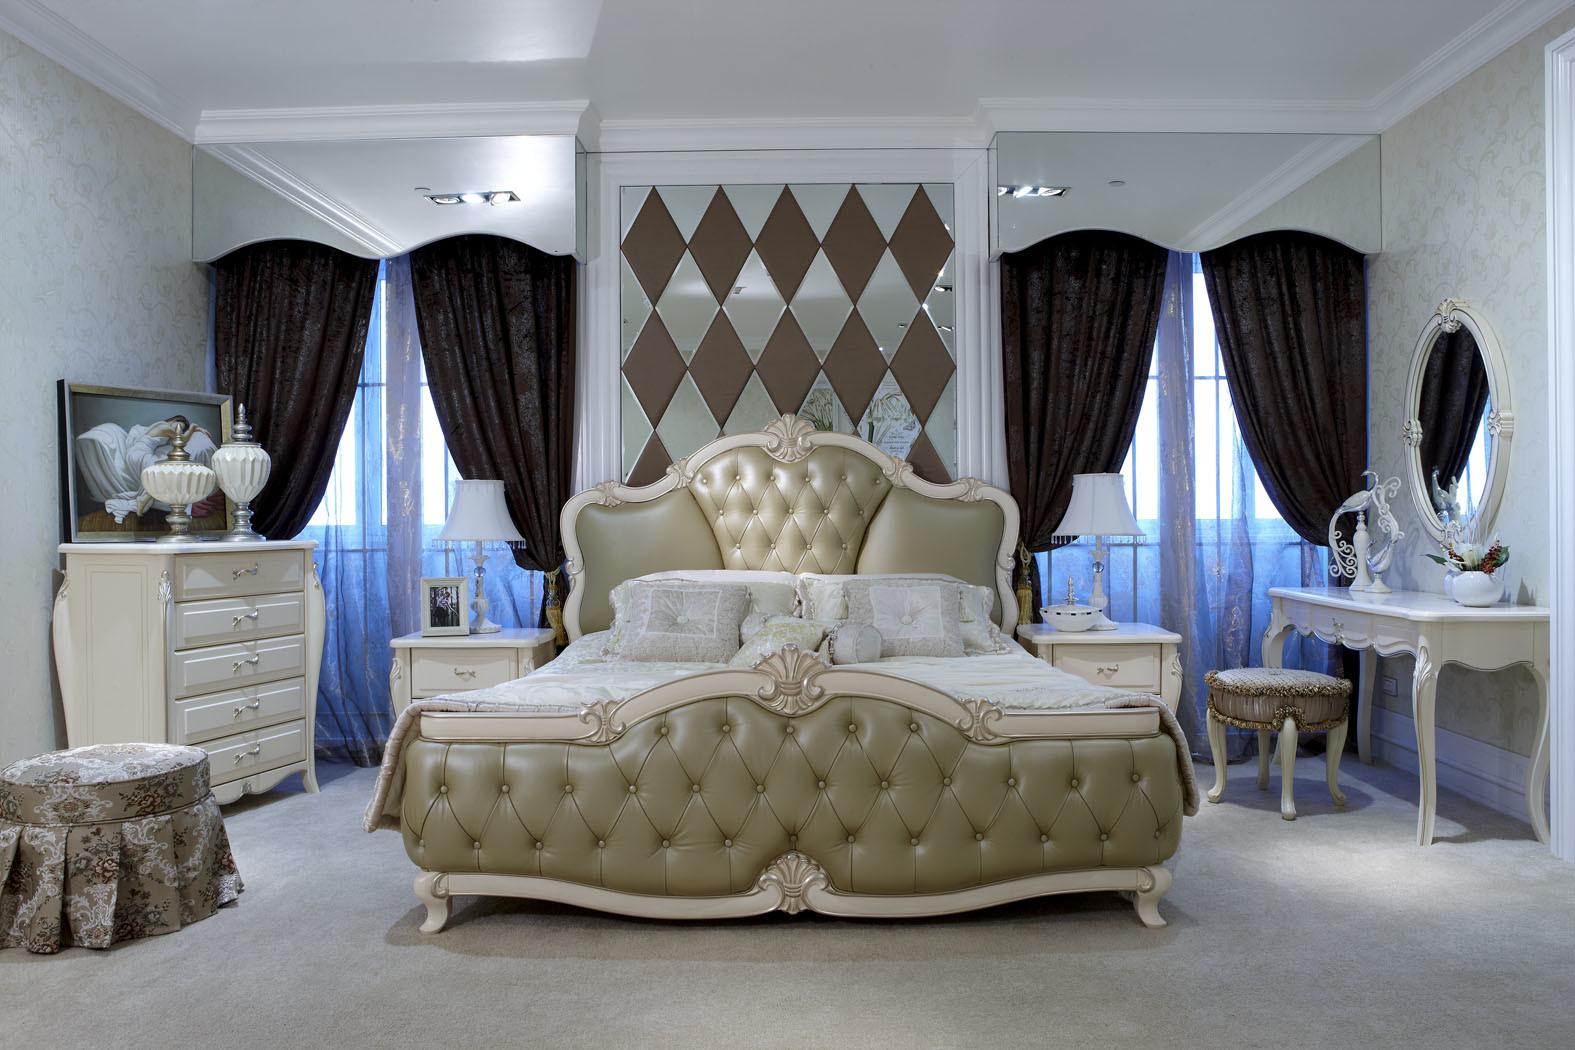 chambre coucher de luxe furniture pour villa et suite chambre coucher de luxe furniture. Black Bedroom Furniture Sets. Home Design Ideas